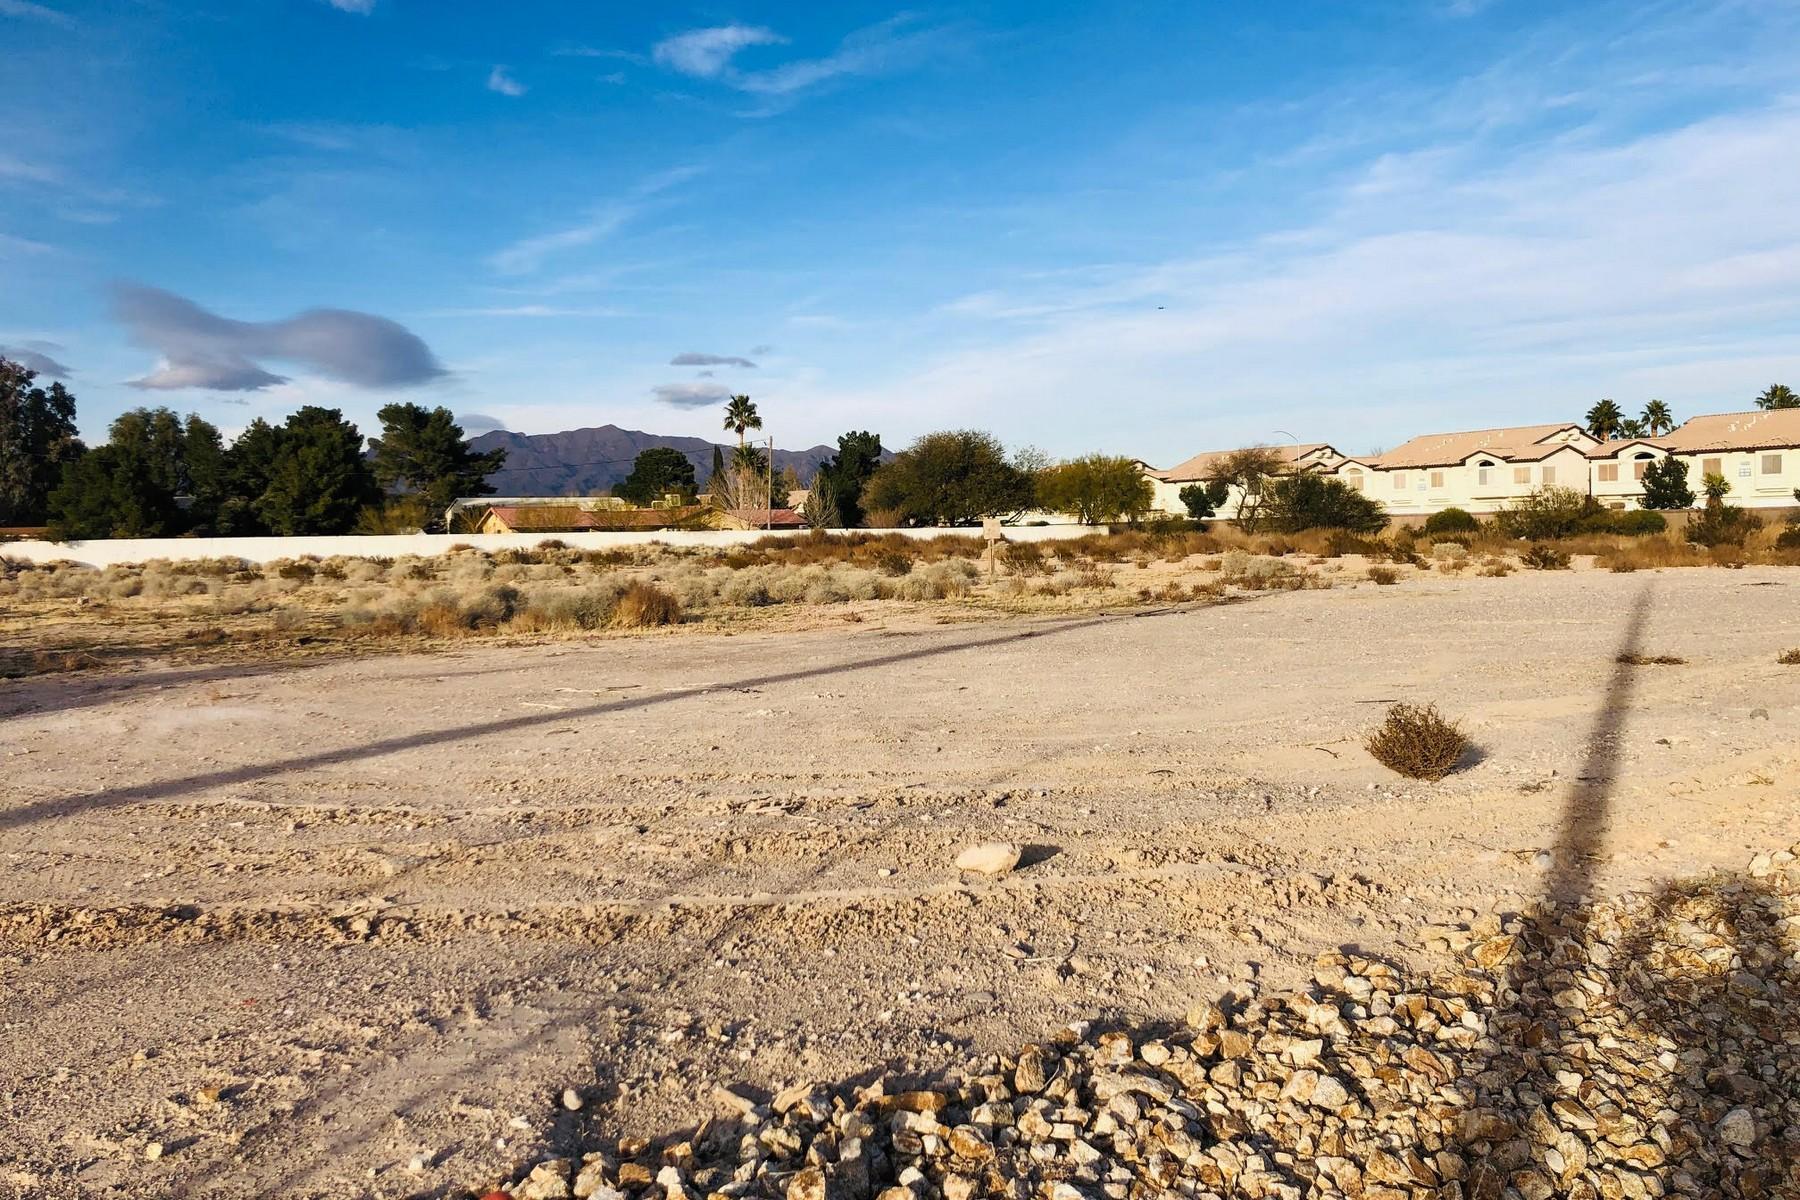 土地,用地 为 销售 在 2 Acre Parcel NW Corner of Tenaya and Lone Mountain Tenaya 拉斯维加斯, 内华达州 89149 美国